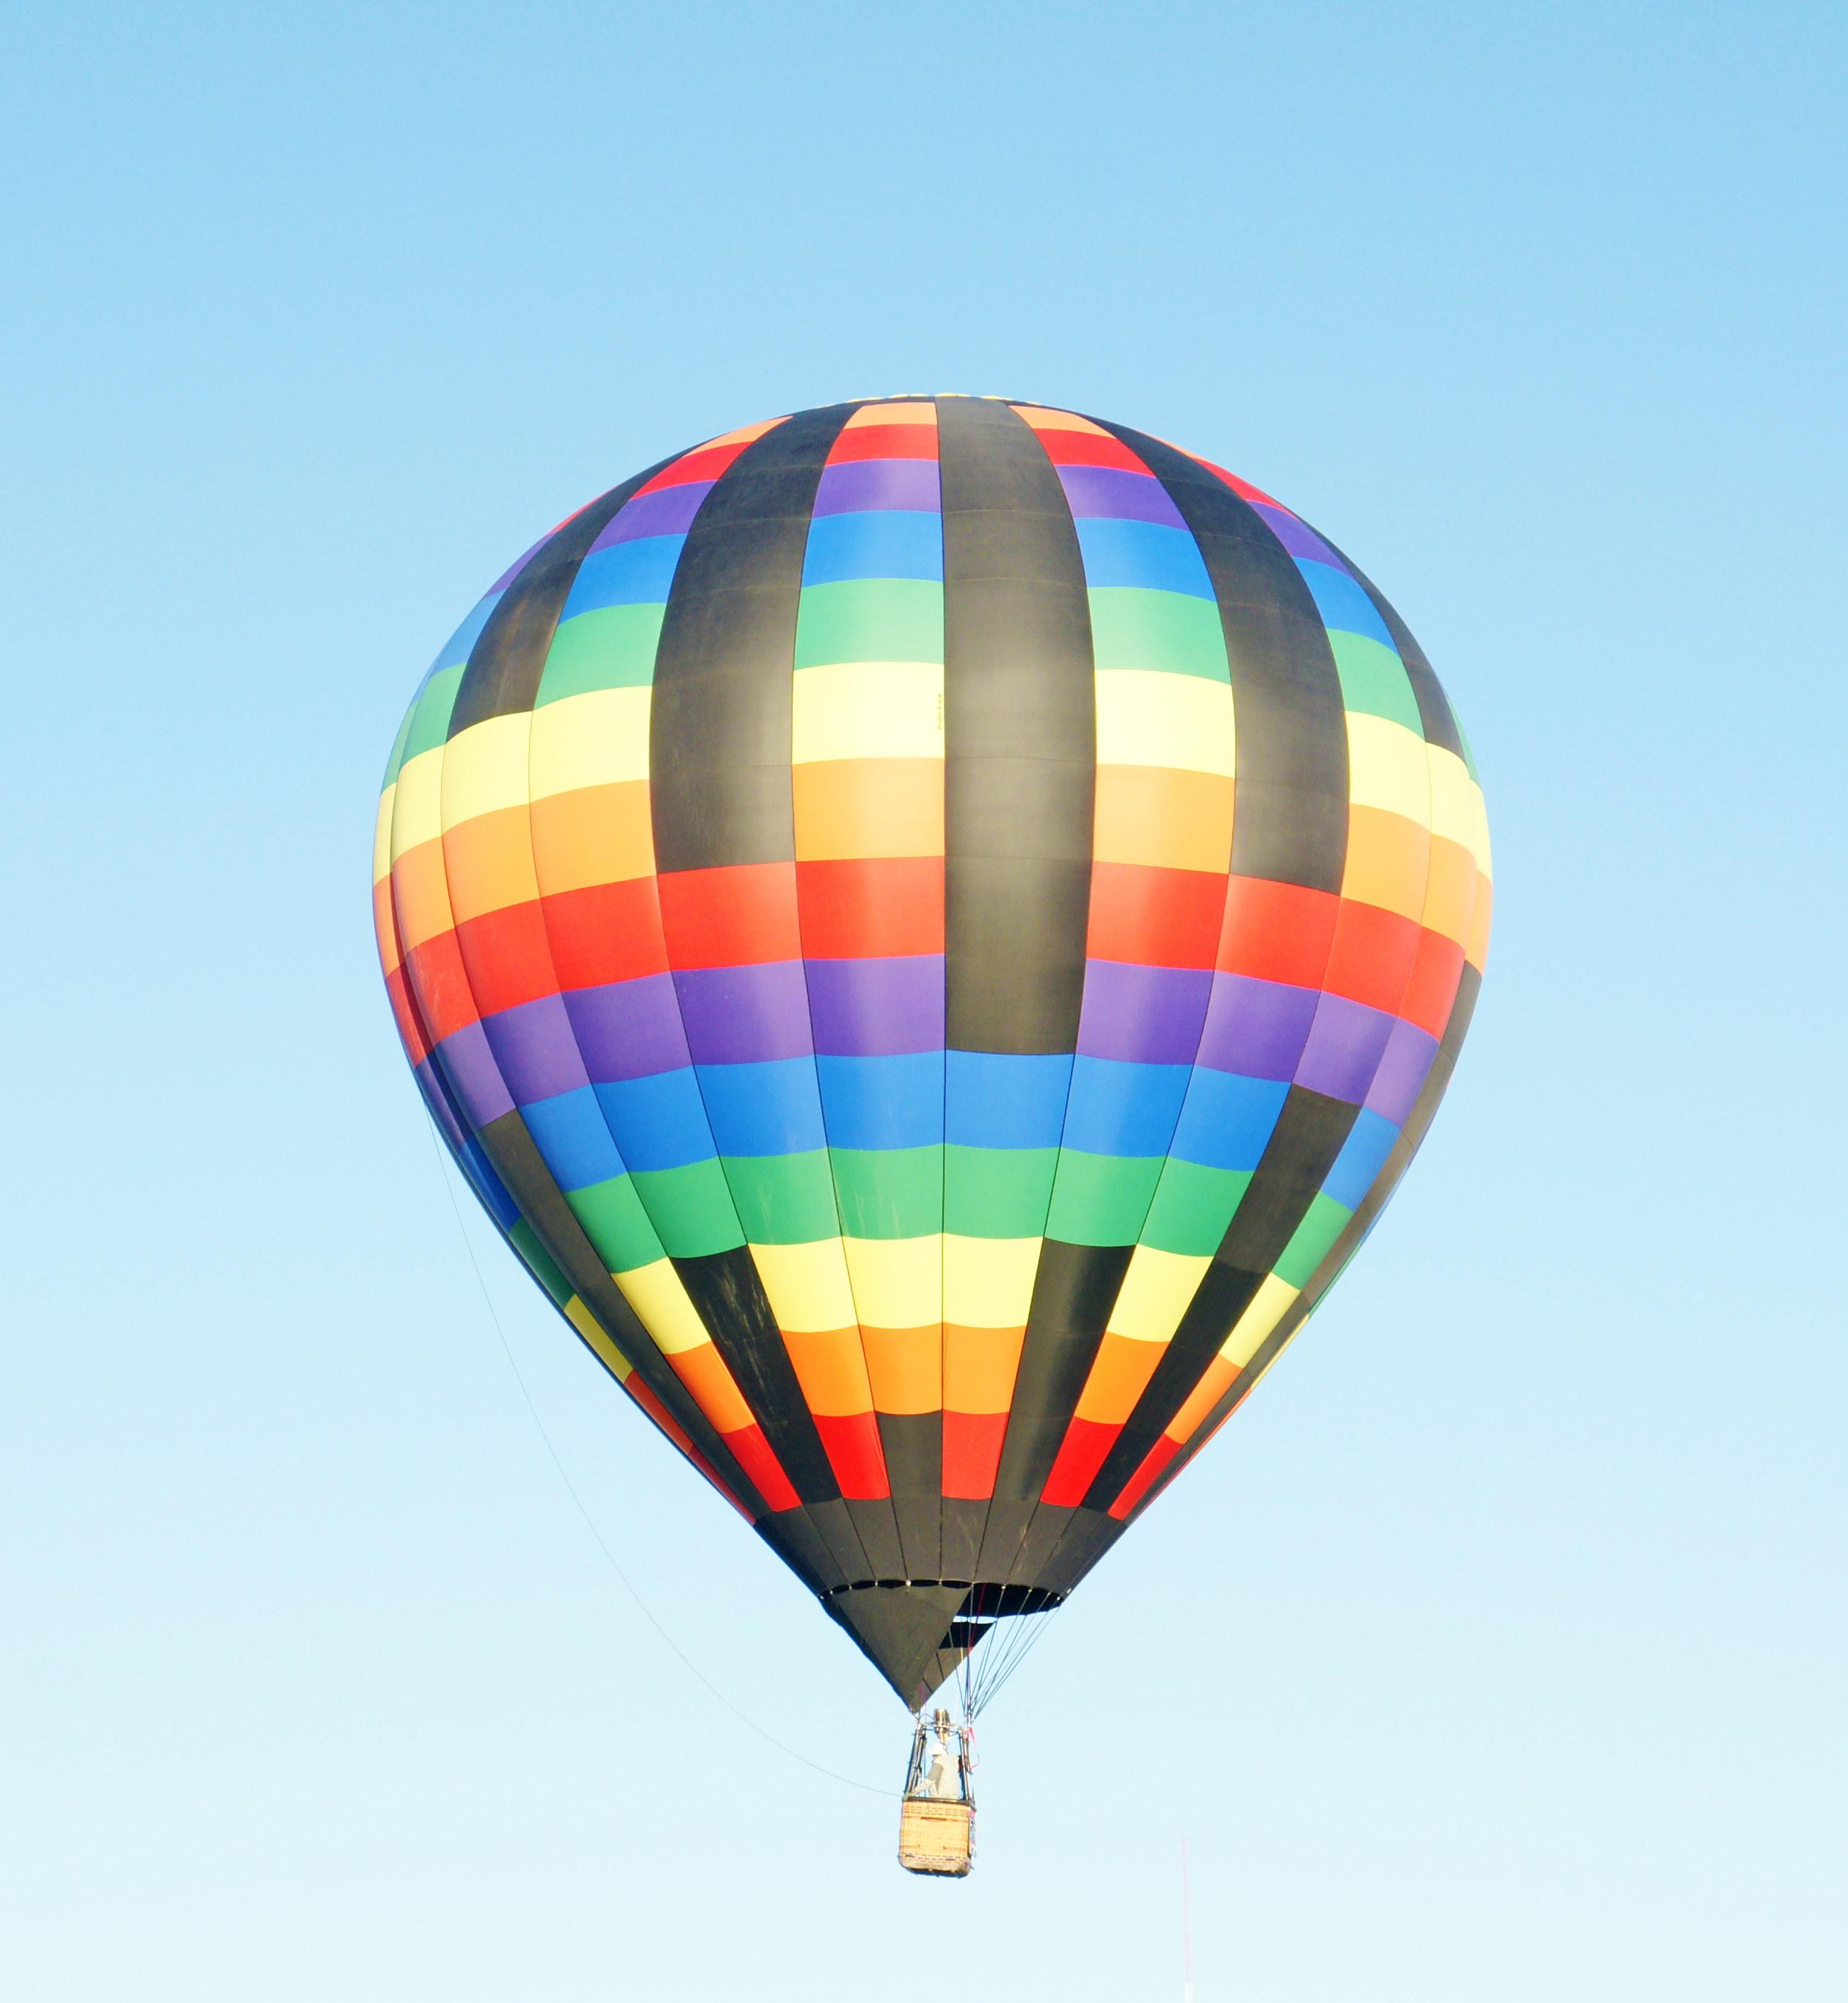 aibf-Single-Balloons-Gallery10